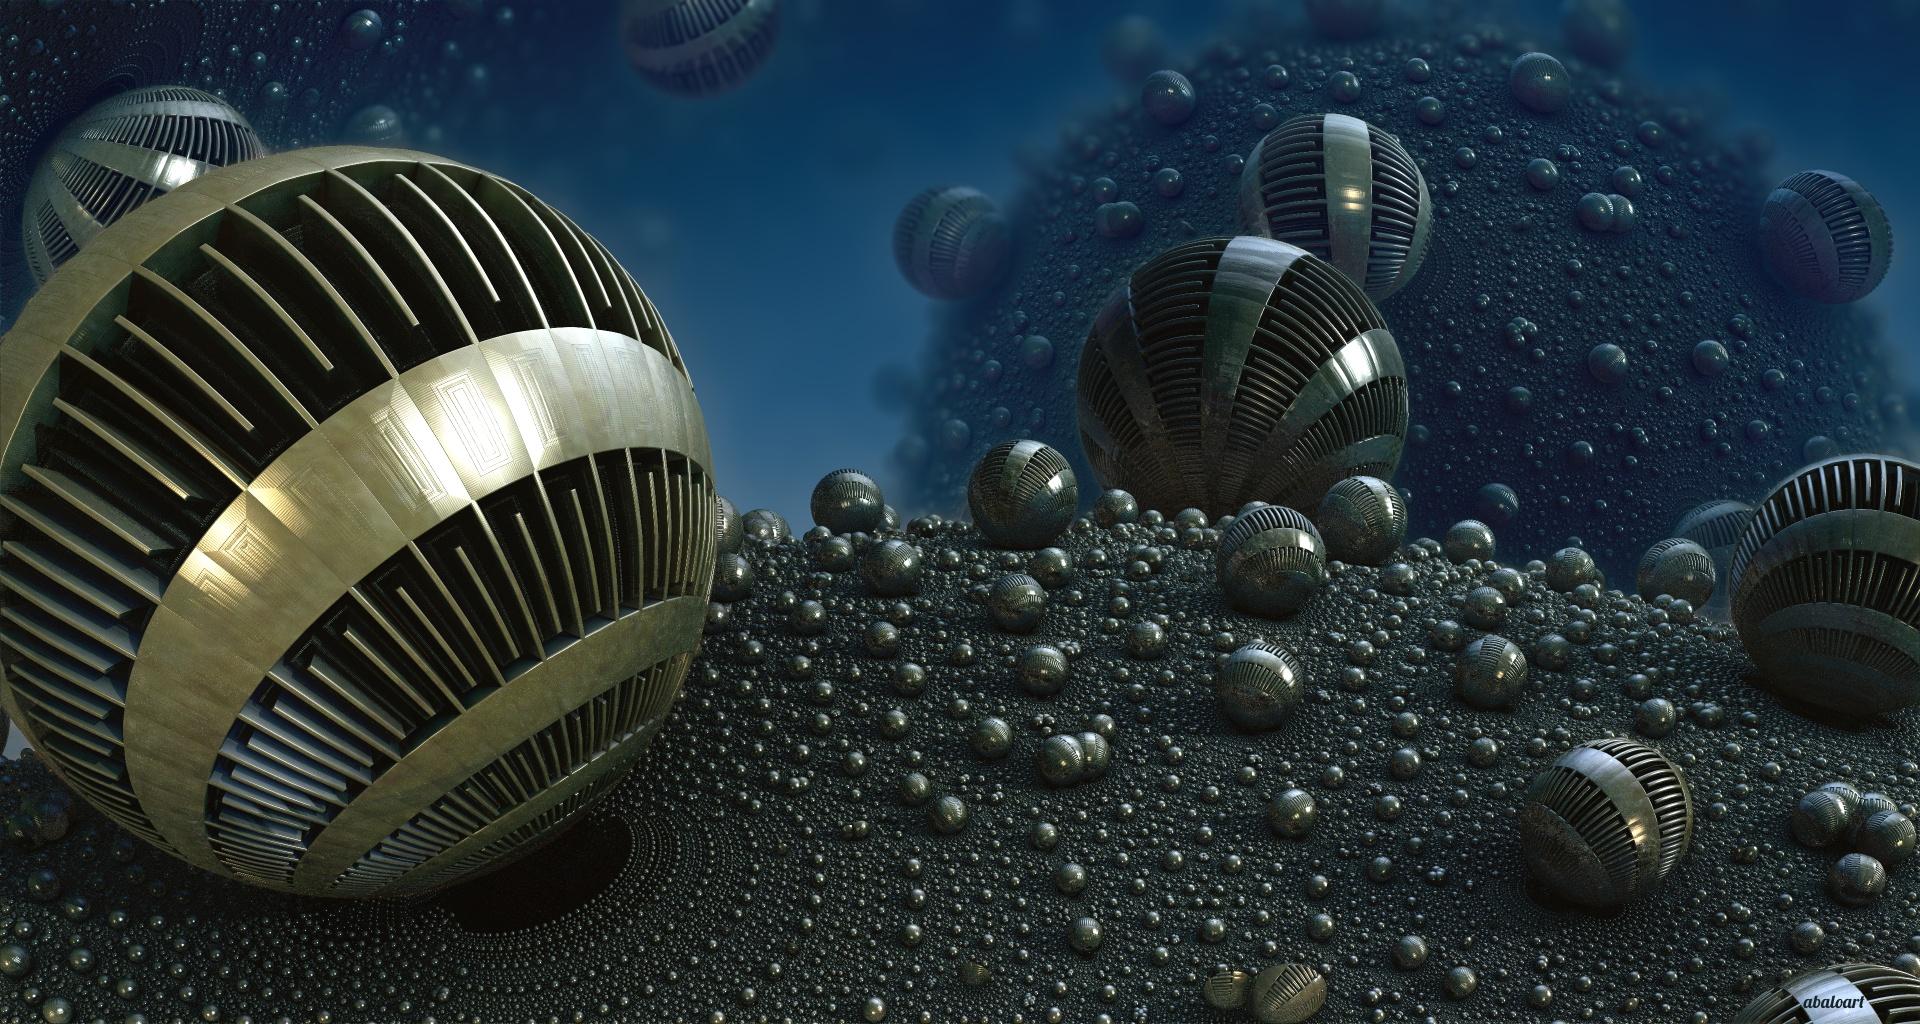 Sphere Machinery by batjorge